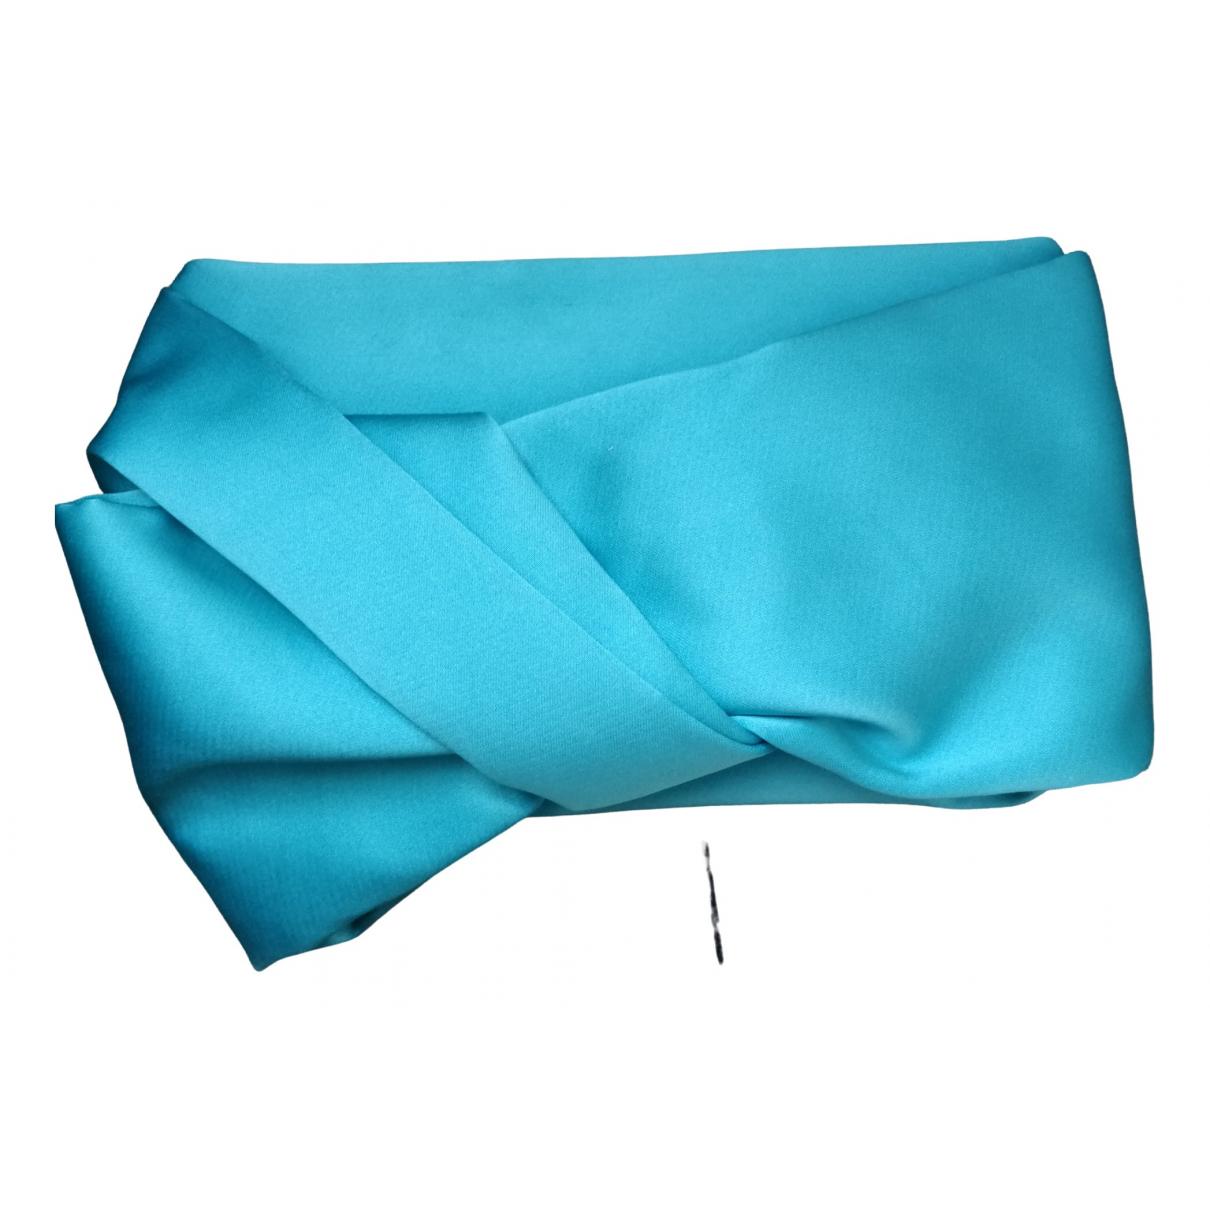 Paule Ka \N Turquoise Silk Clutch bag for Women \N